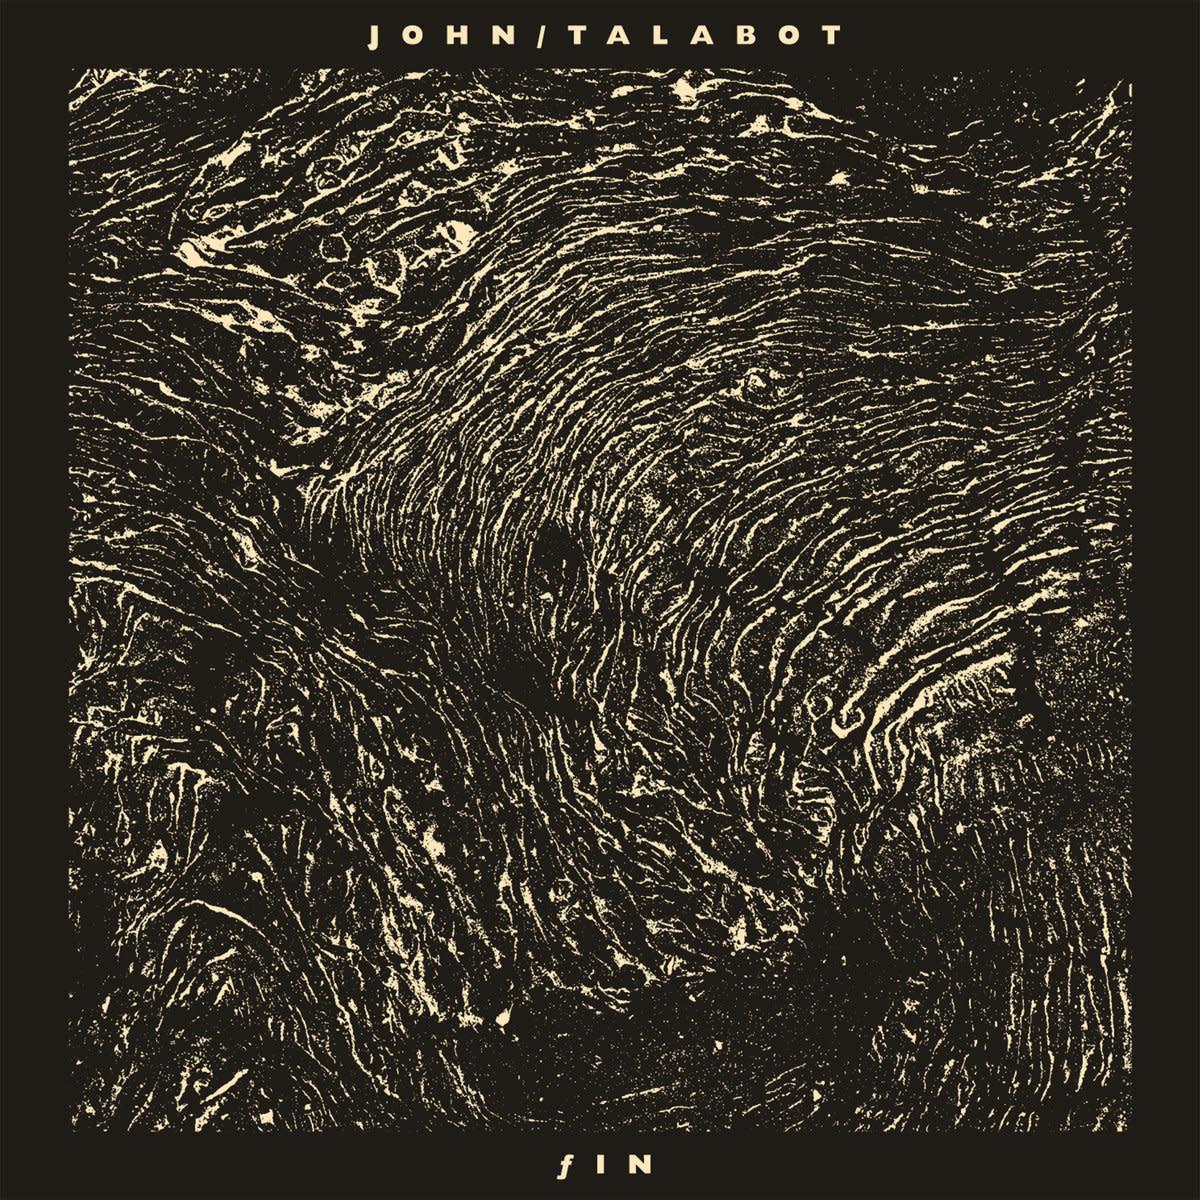 Permanent Vacation John Talabot - Fin